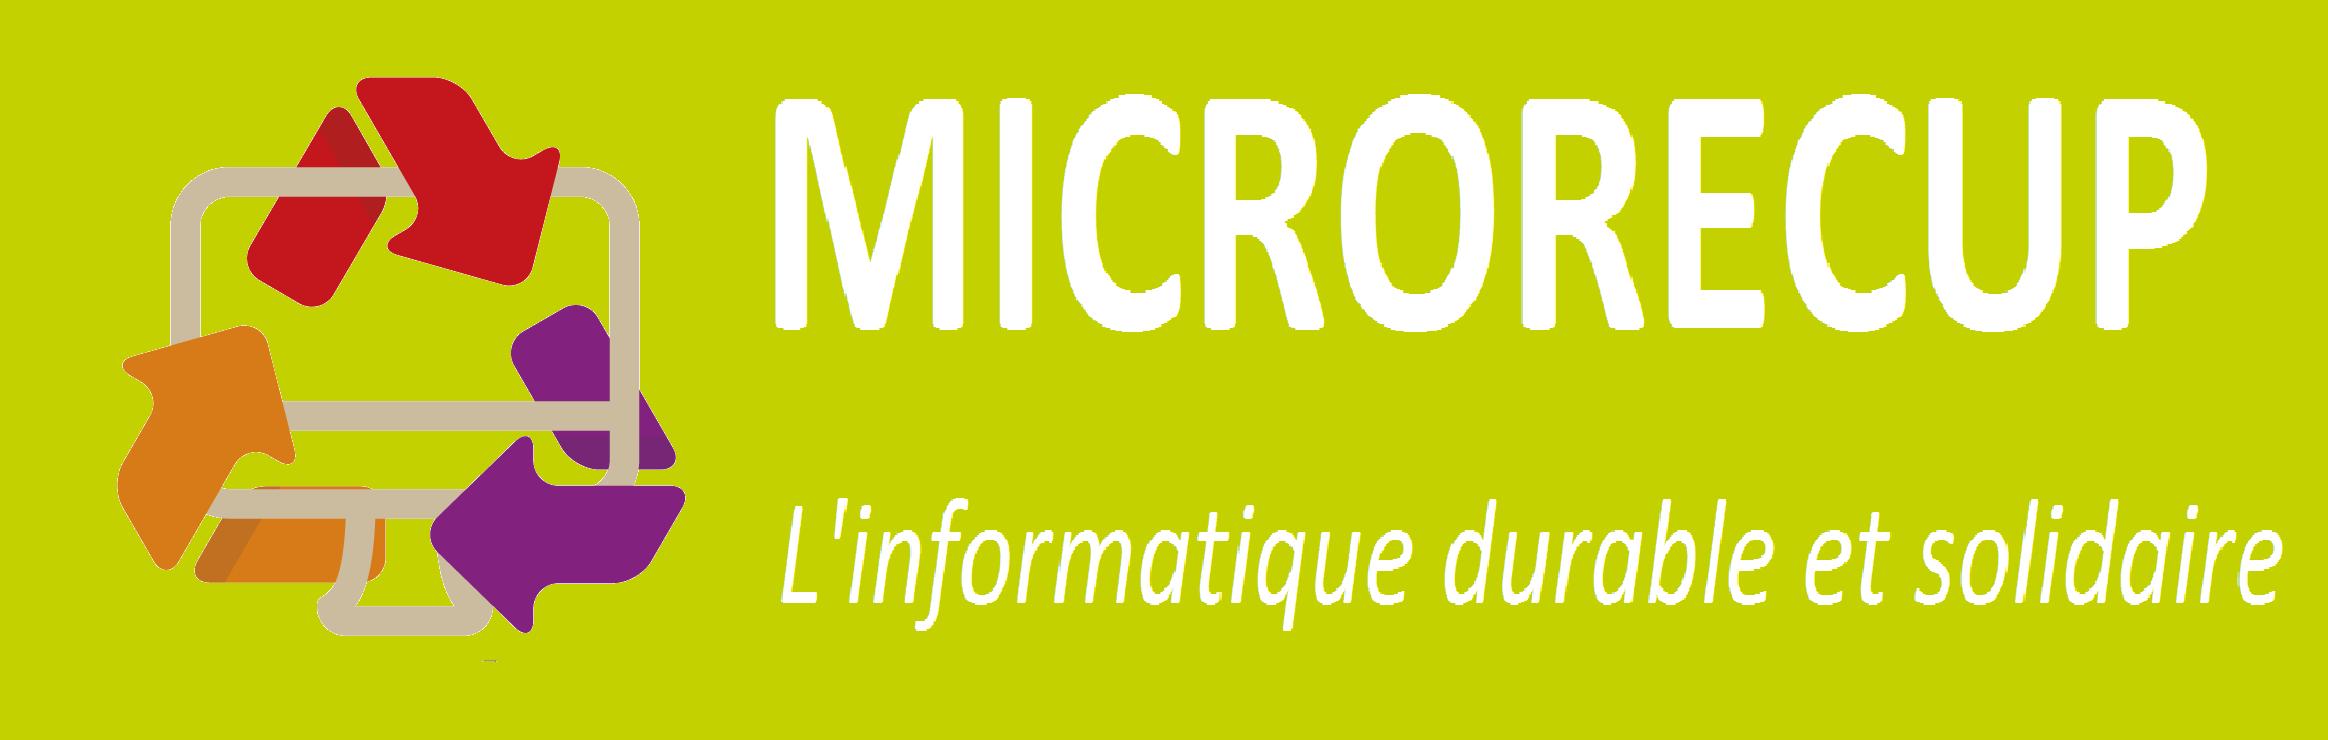 Microrecup